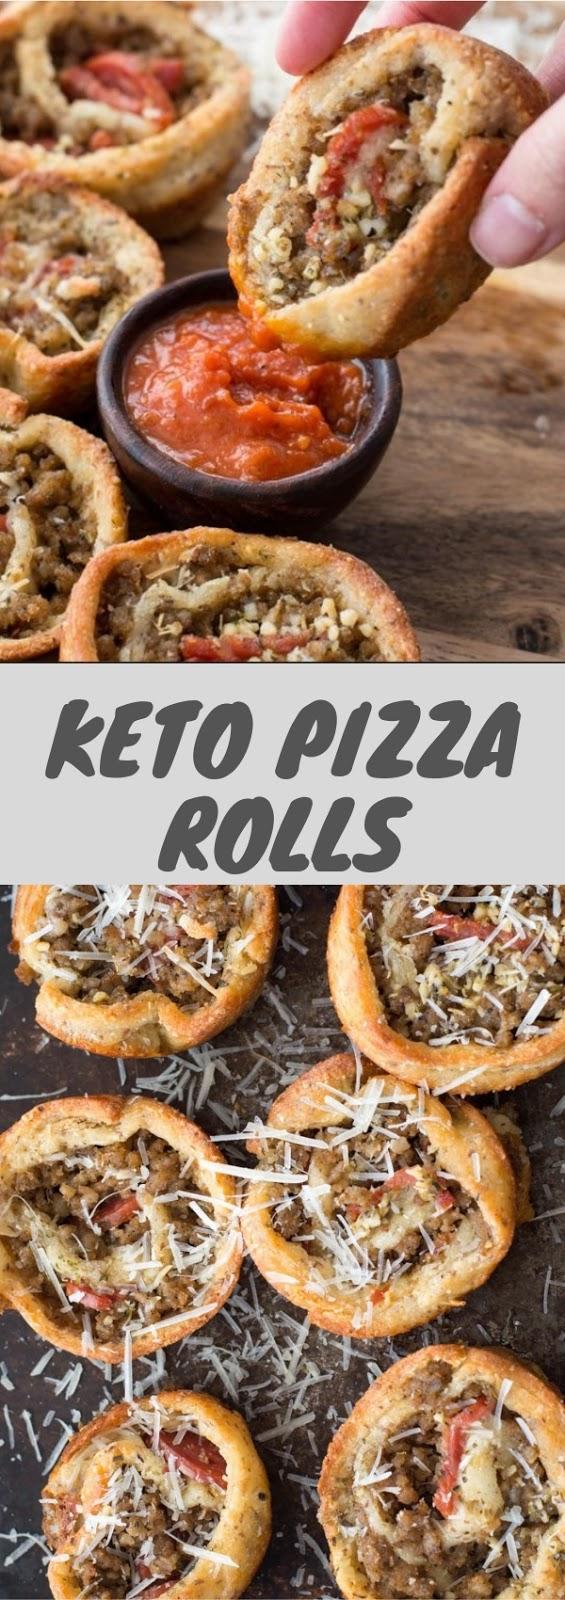 Keto Pizza Rolls #appetizer #dinner #keto #pizza #roll